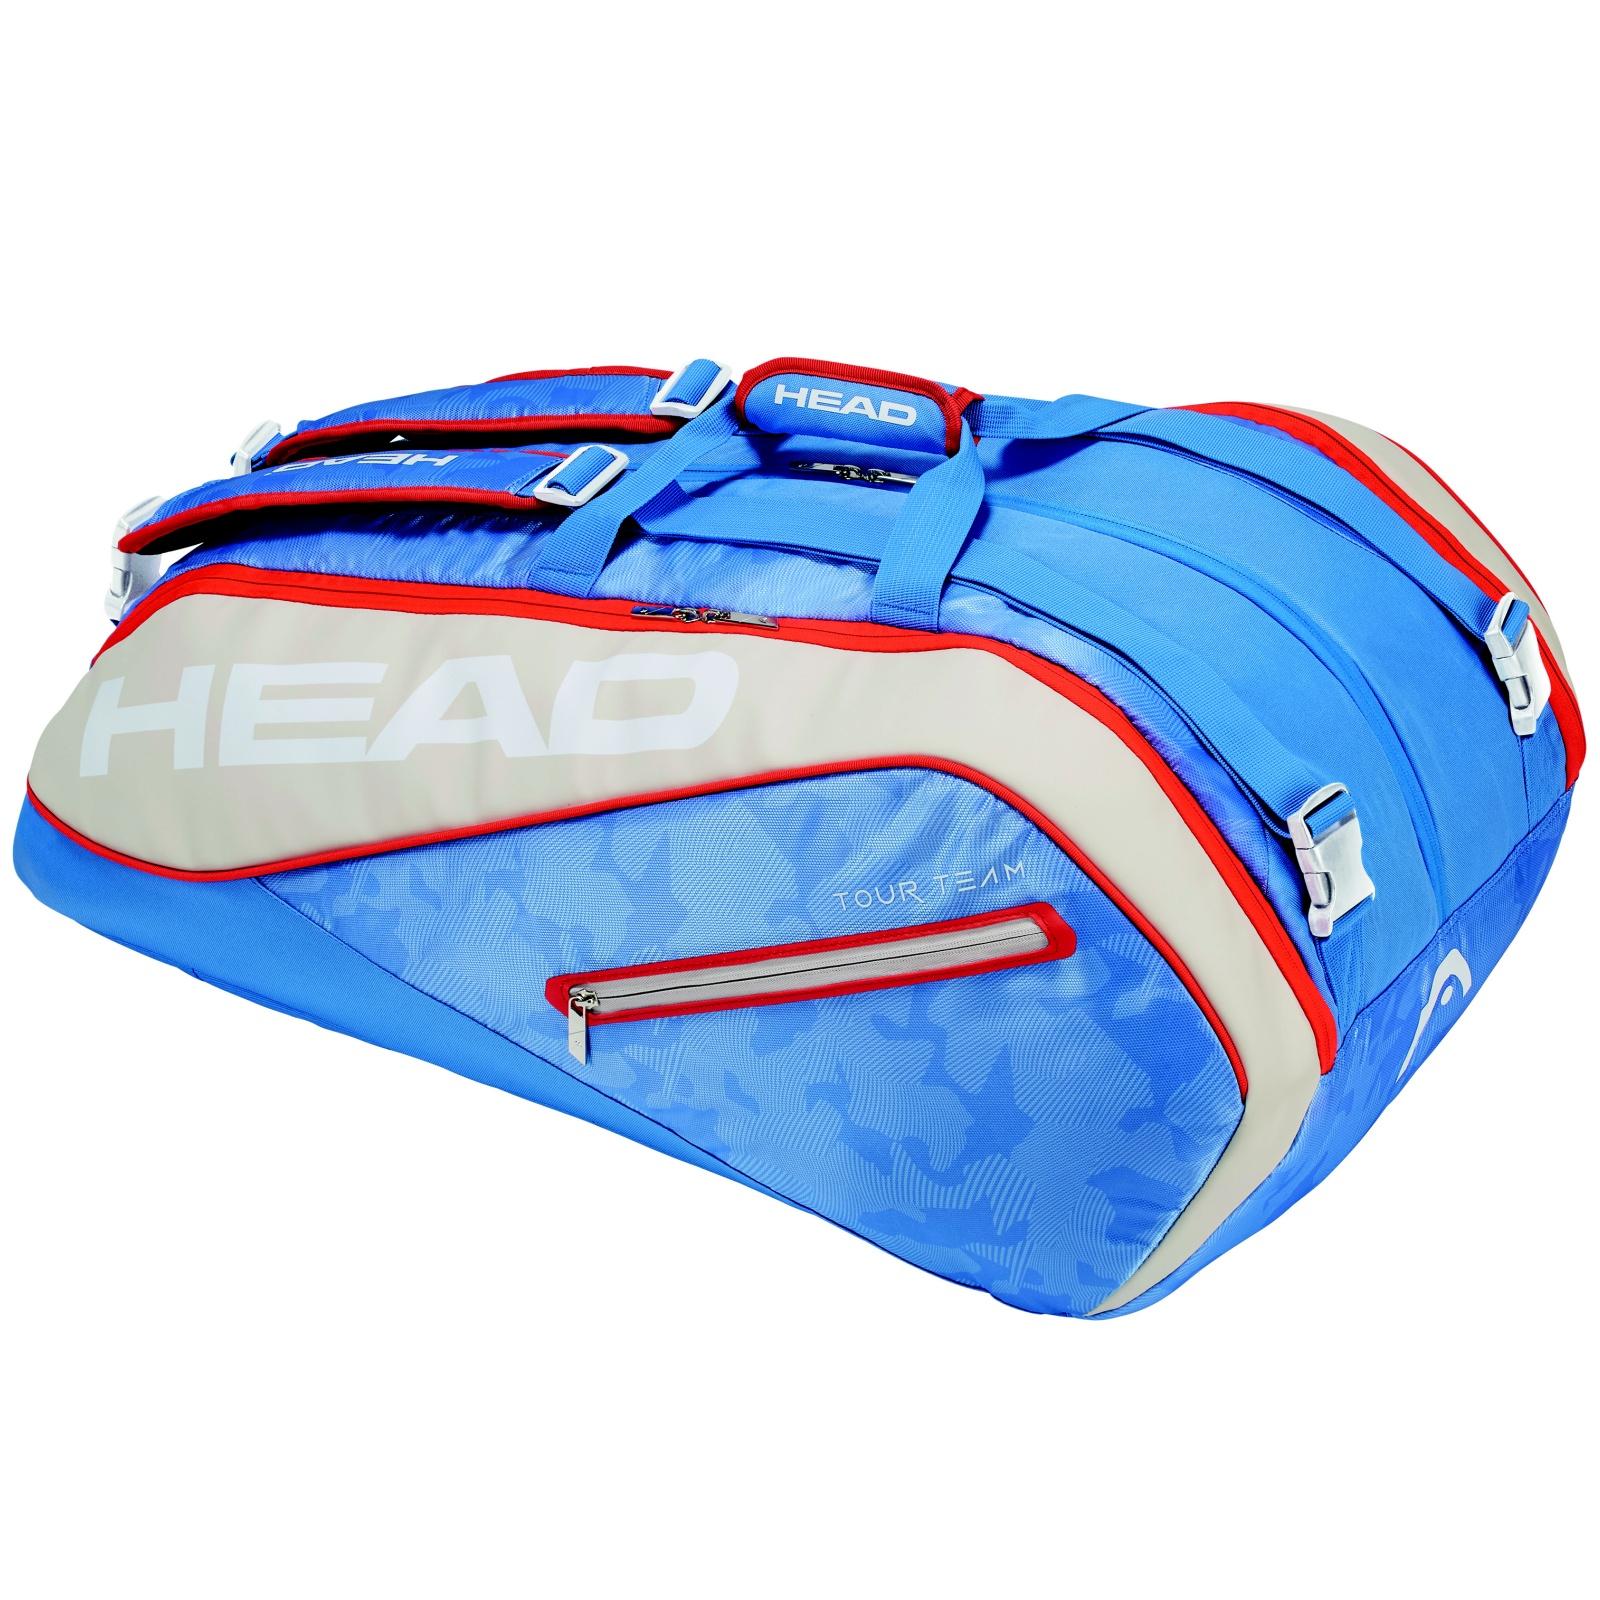 Tenisová taška HEAD Tour 12R Monstercombi - modrá